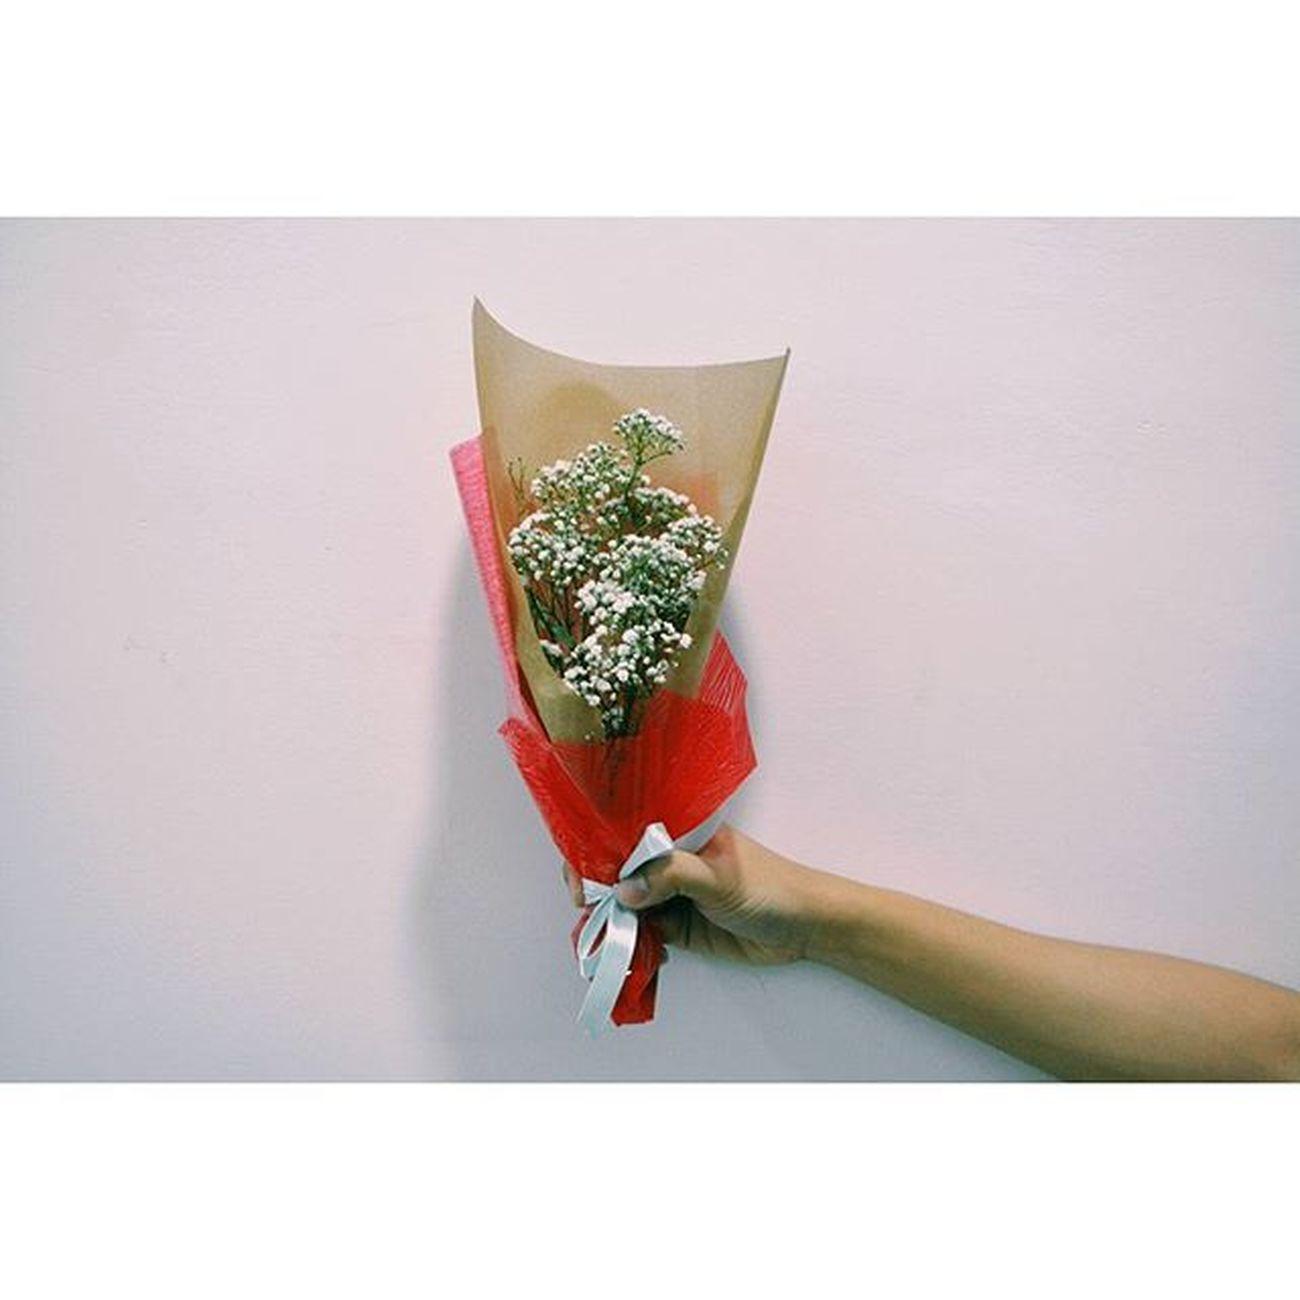 A little bouquet of baby's-breath for the speacial you. Happy Valentine's Day.💜 140216 Sunday Photography Nikon DSLR D5200 Lenovo Portrait Instagram Instapost Instalike Instadaily VSCO Vscofile Vscocam Myalbum